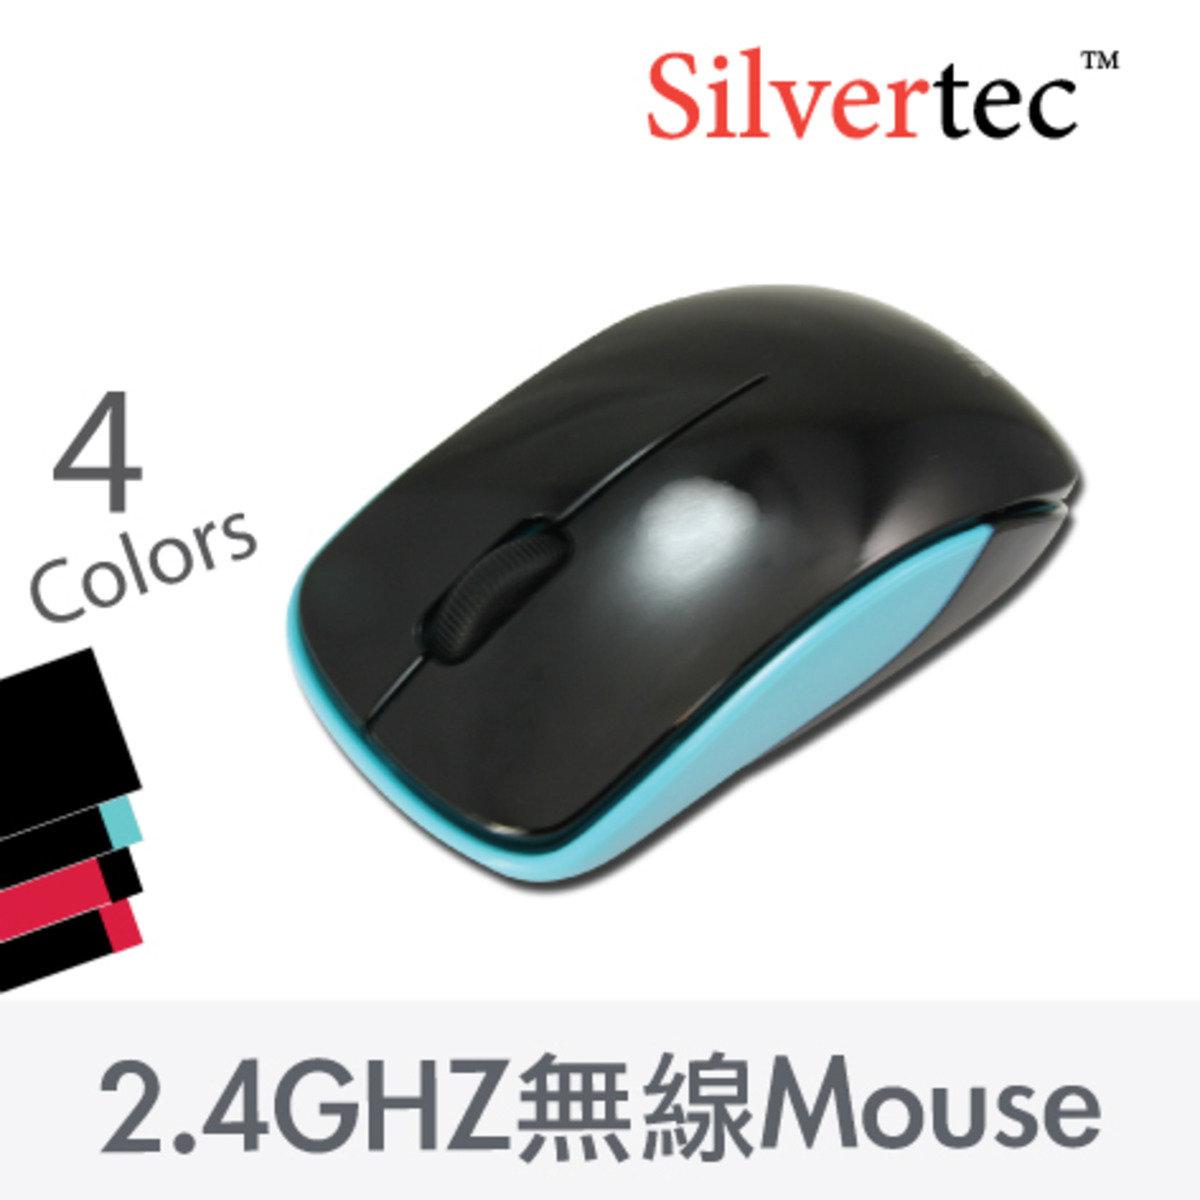 2.4GHz 無線滑鼠 黑色